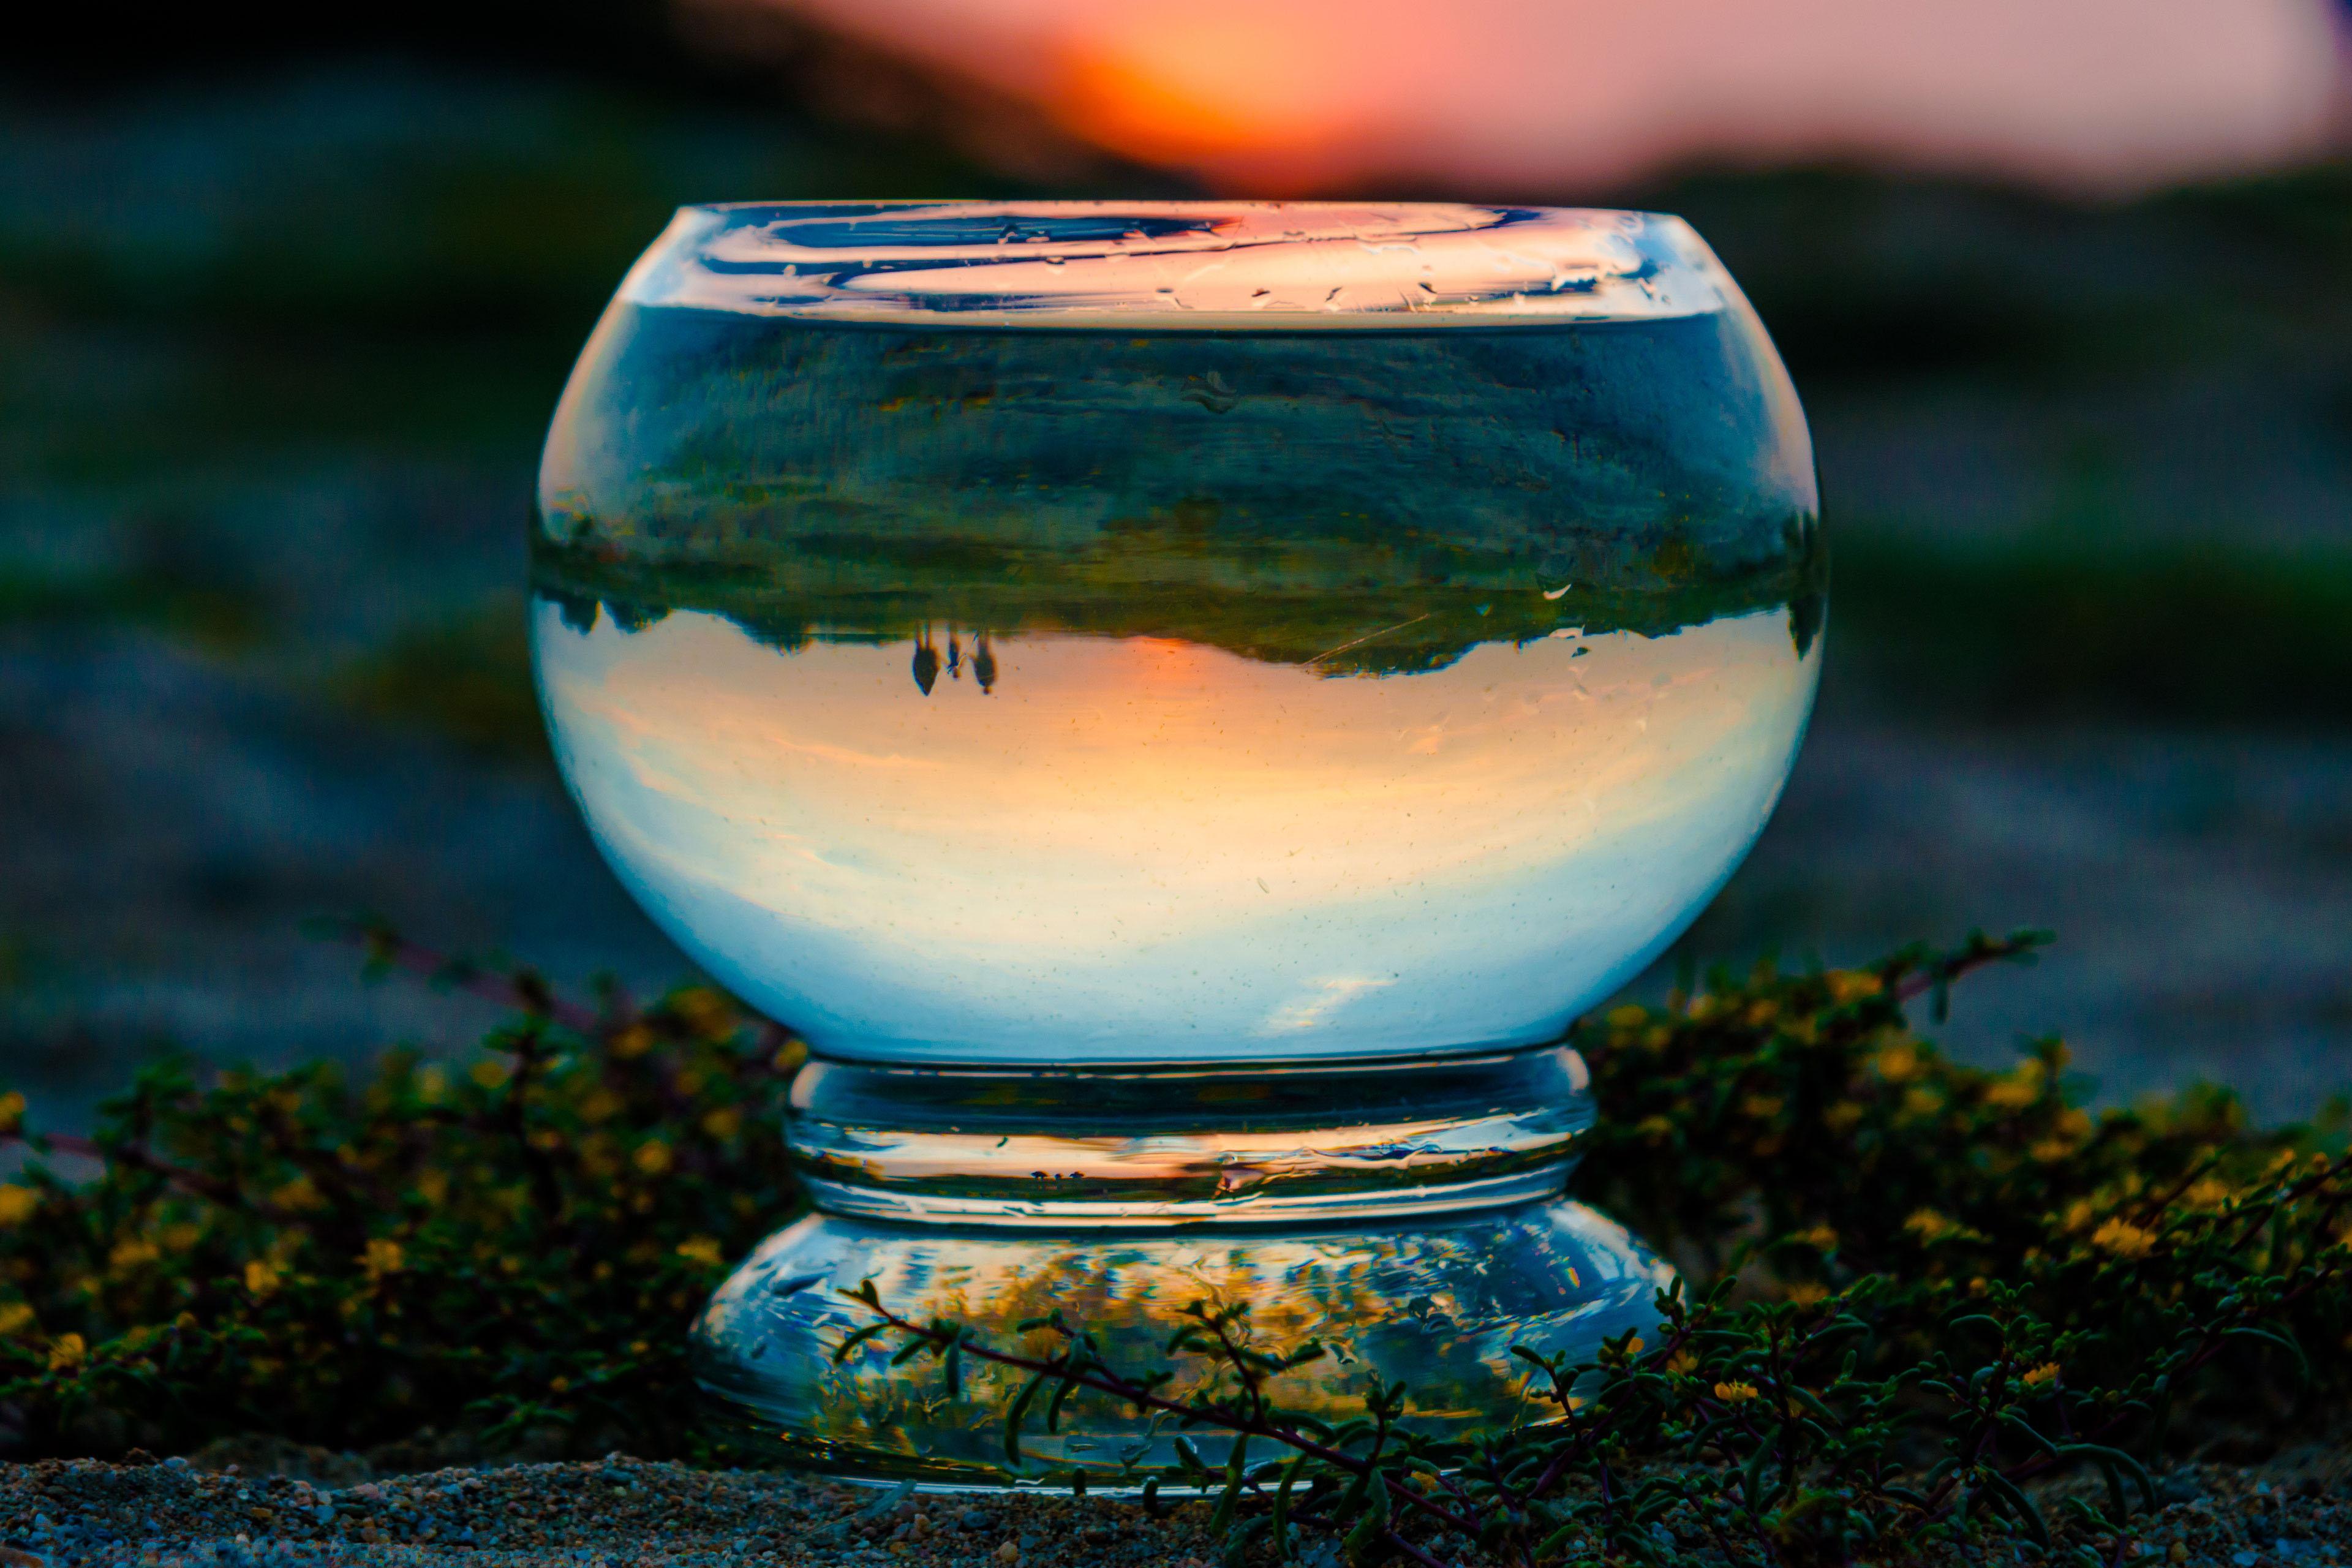 Nature view through glass globe